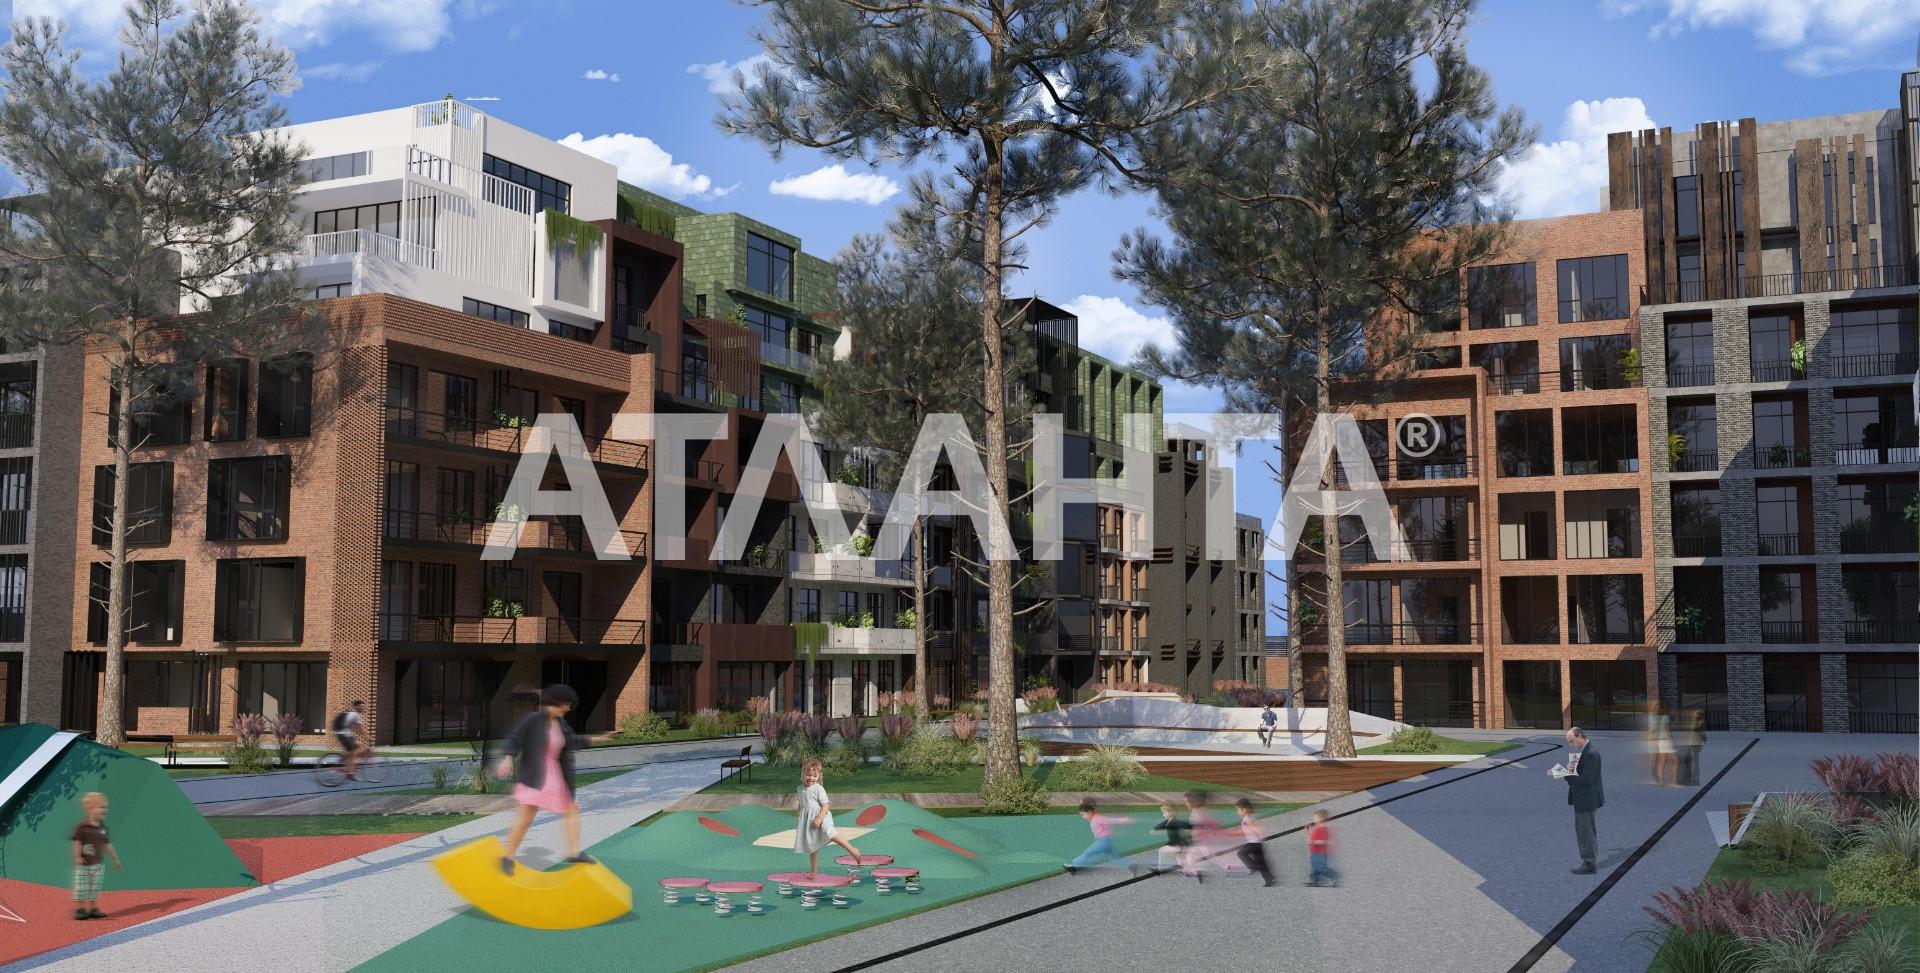 Продается 2-комнатная Квартира на ул. Донского Дмитрия — 52 640 у.е. (фото №2)